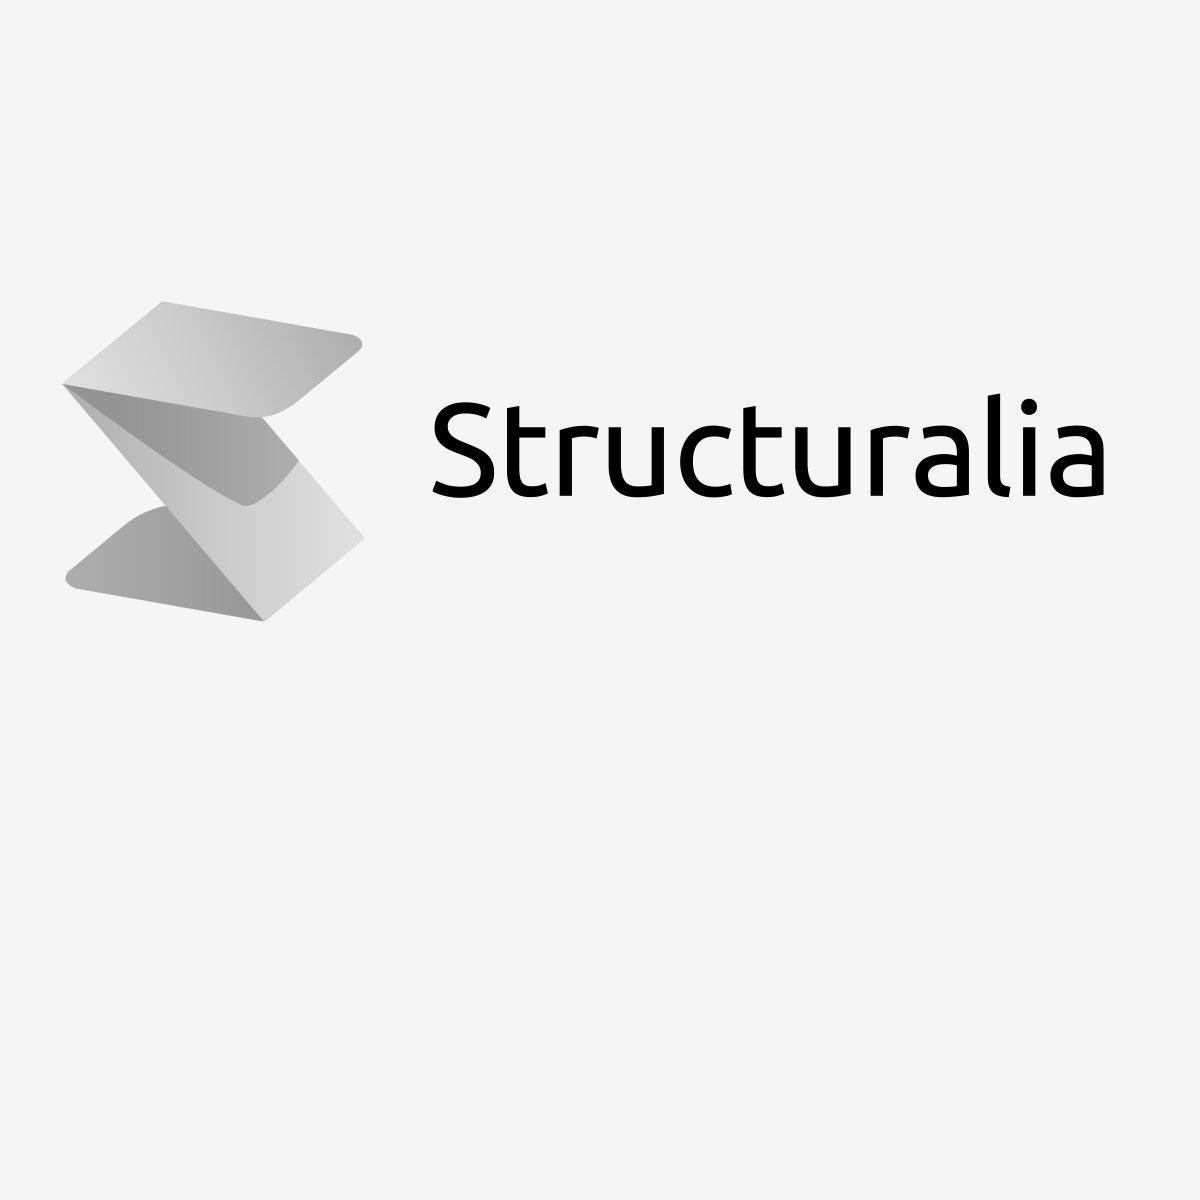 imagen logo-1